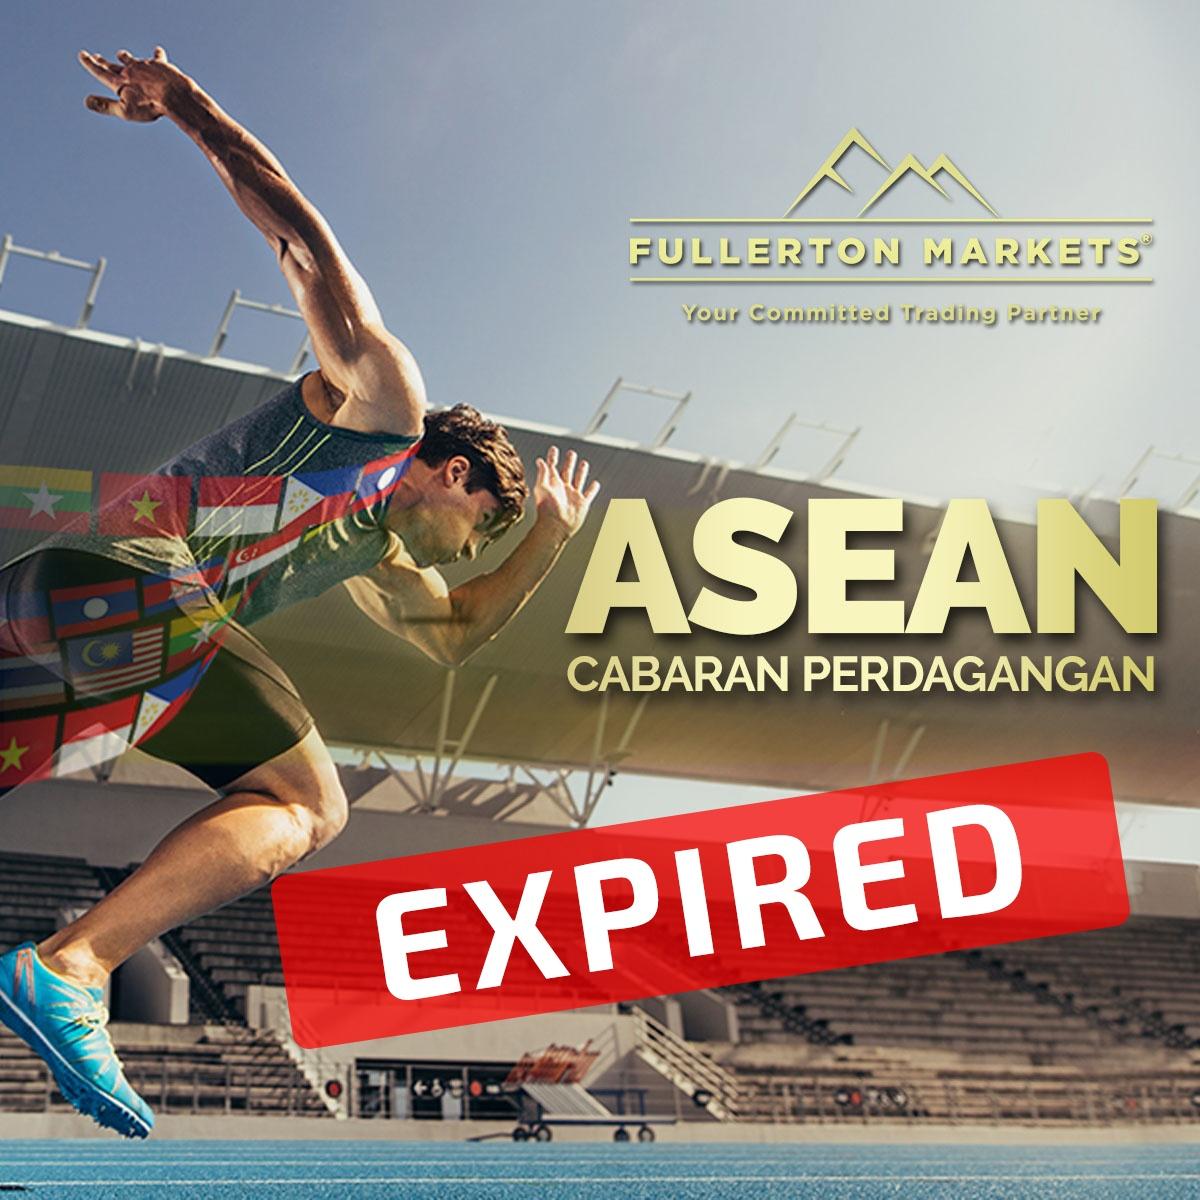 asean-trading-chellenge_IG_MS_1200x1200_expired